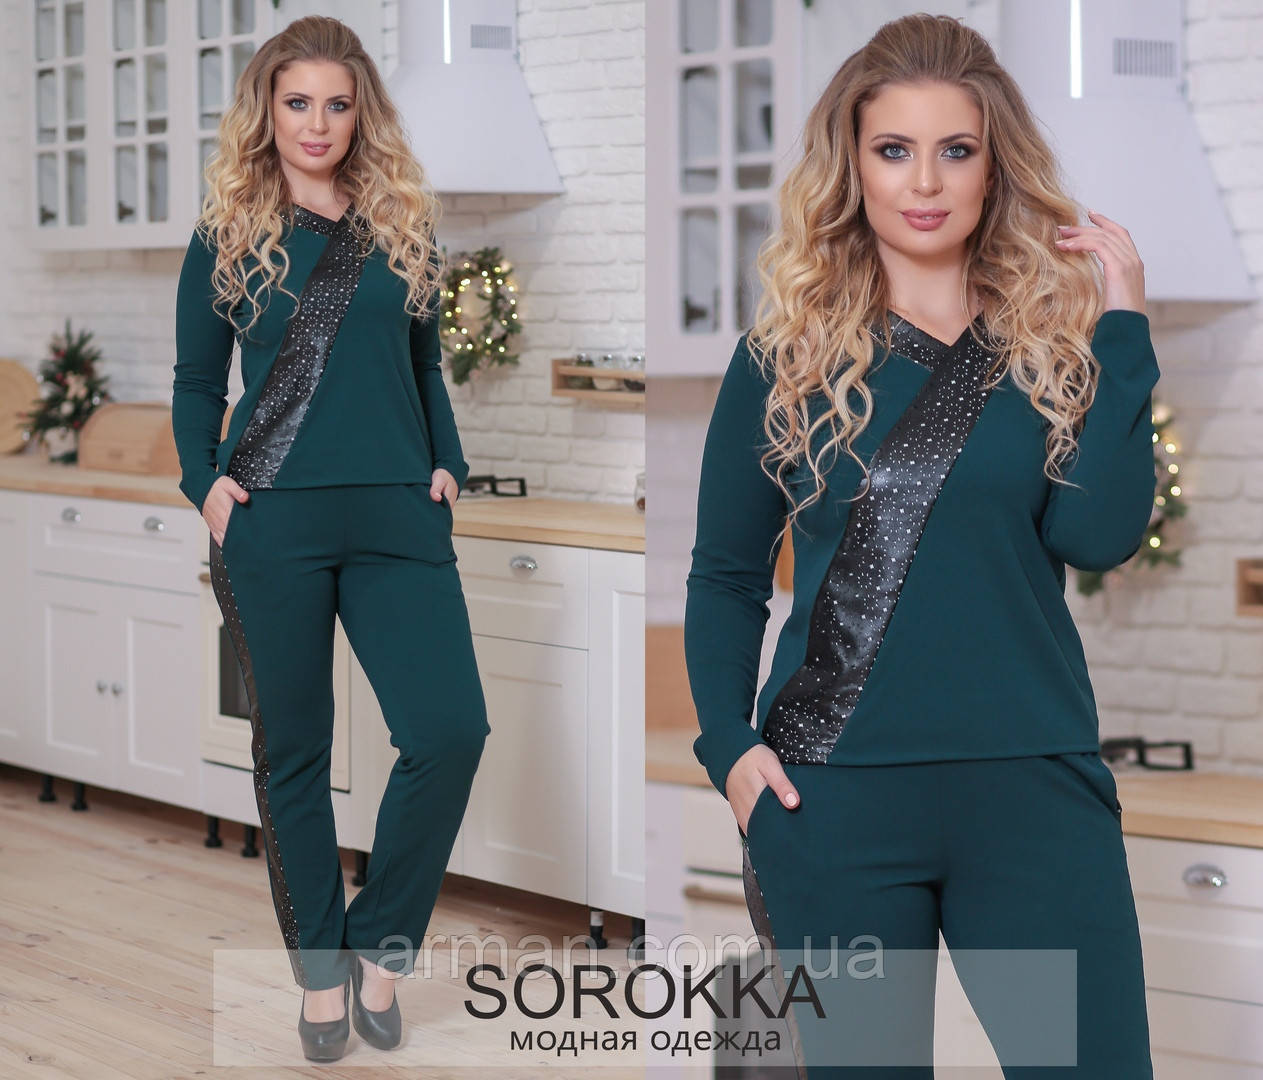 Прогулочный женский костюм от ТМ SOROKKA-Размер: 48-50, 52-54, фото 1